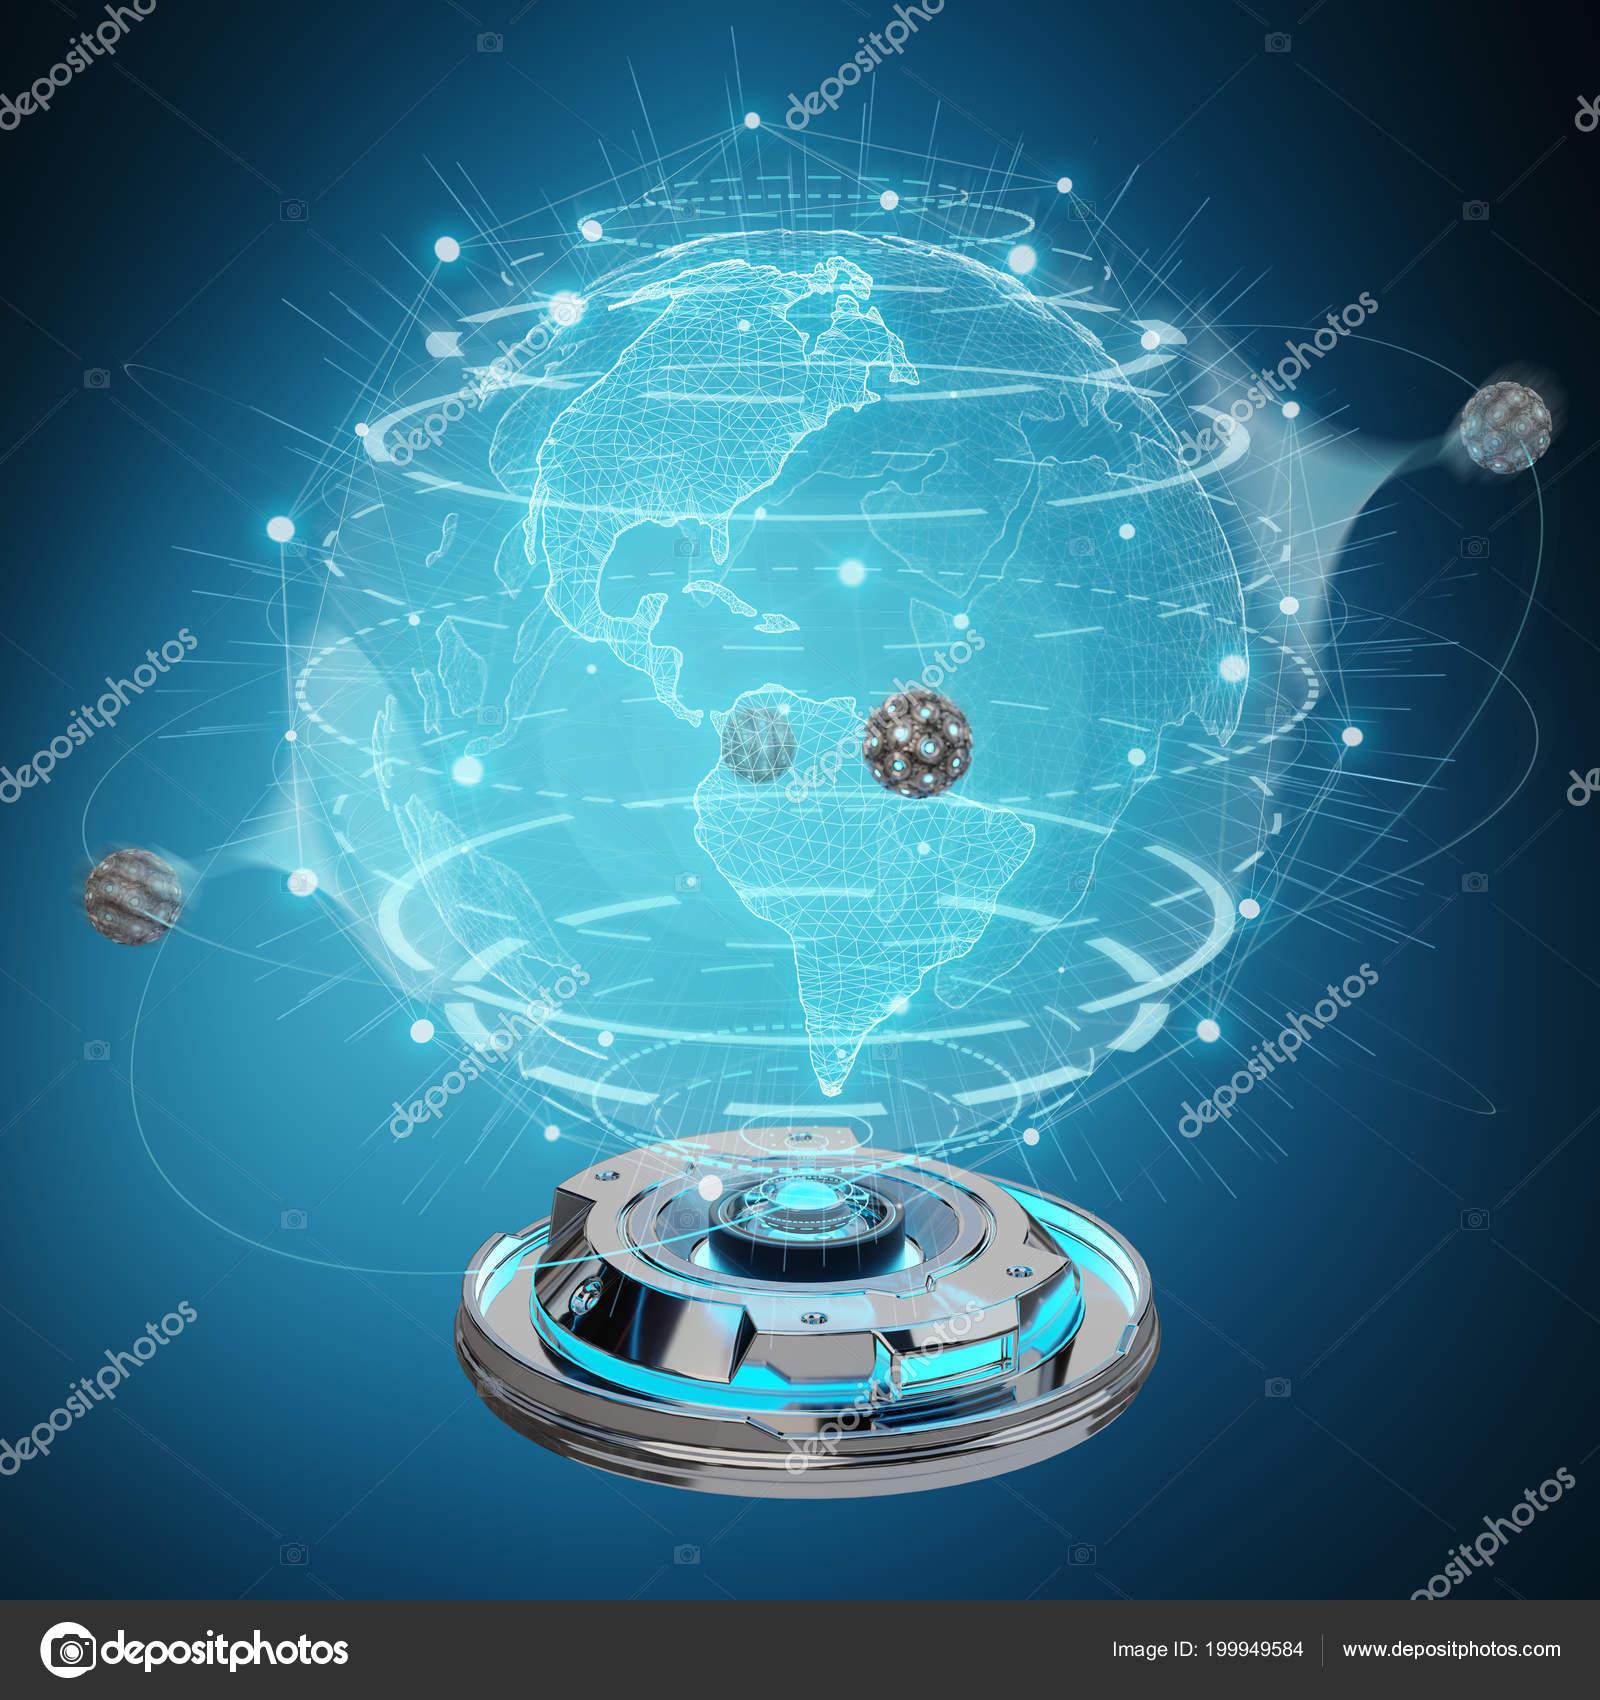 Globe Network Hologram Projector Digital Connection Blue Background